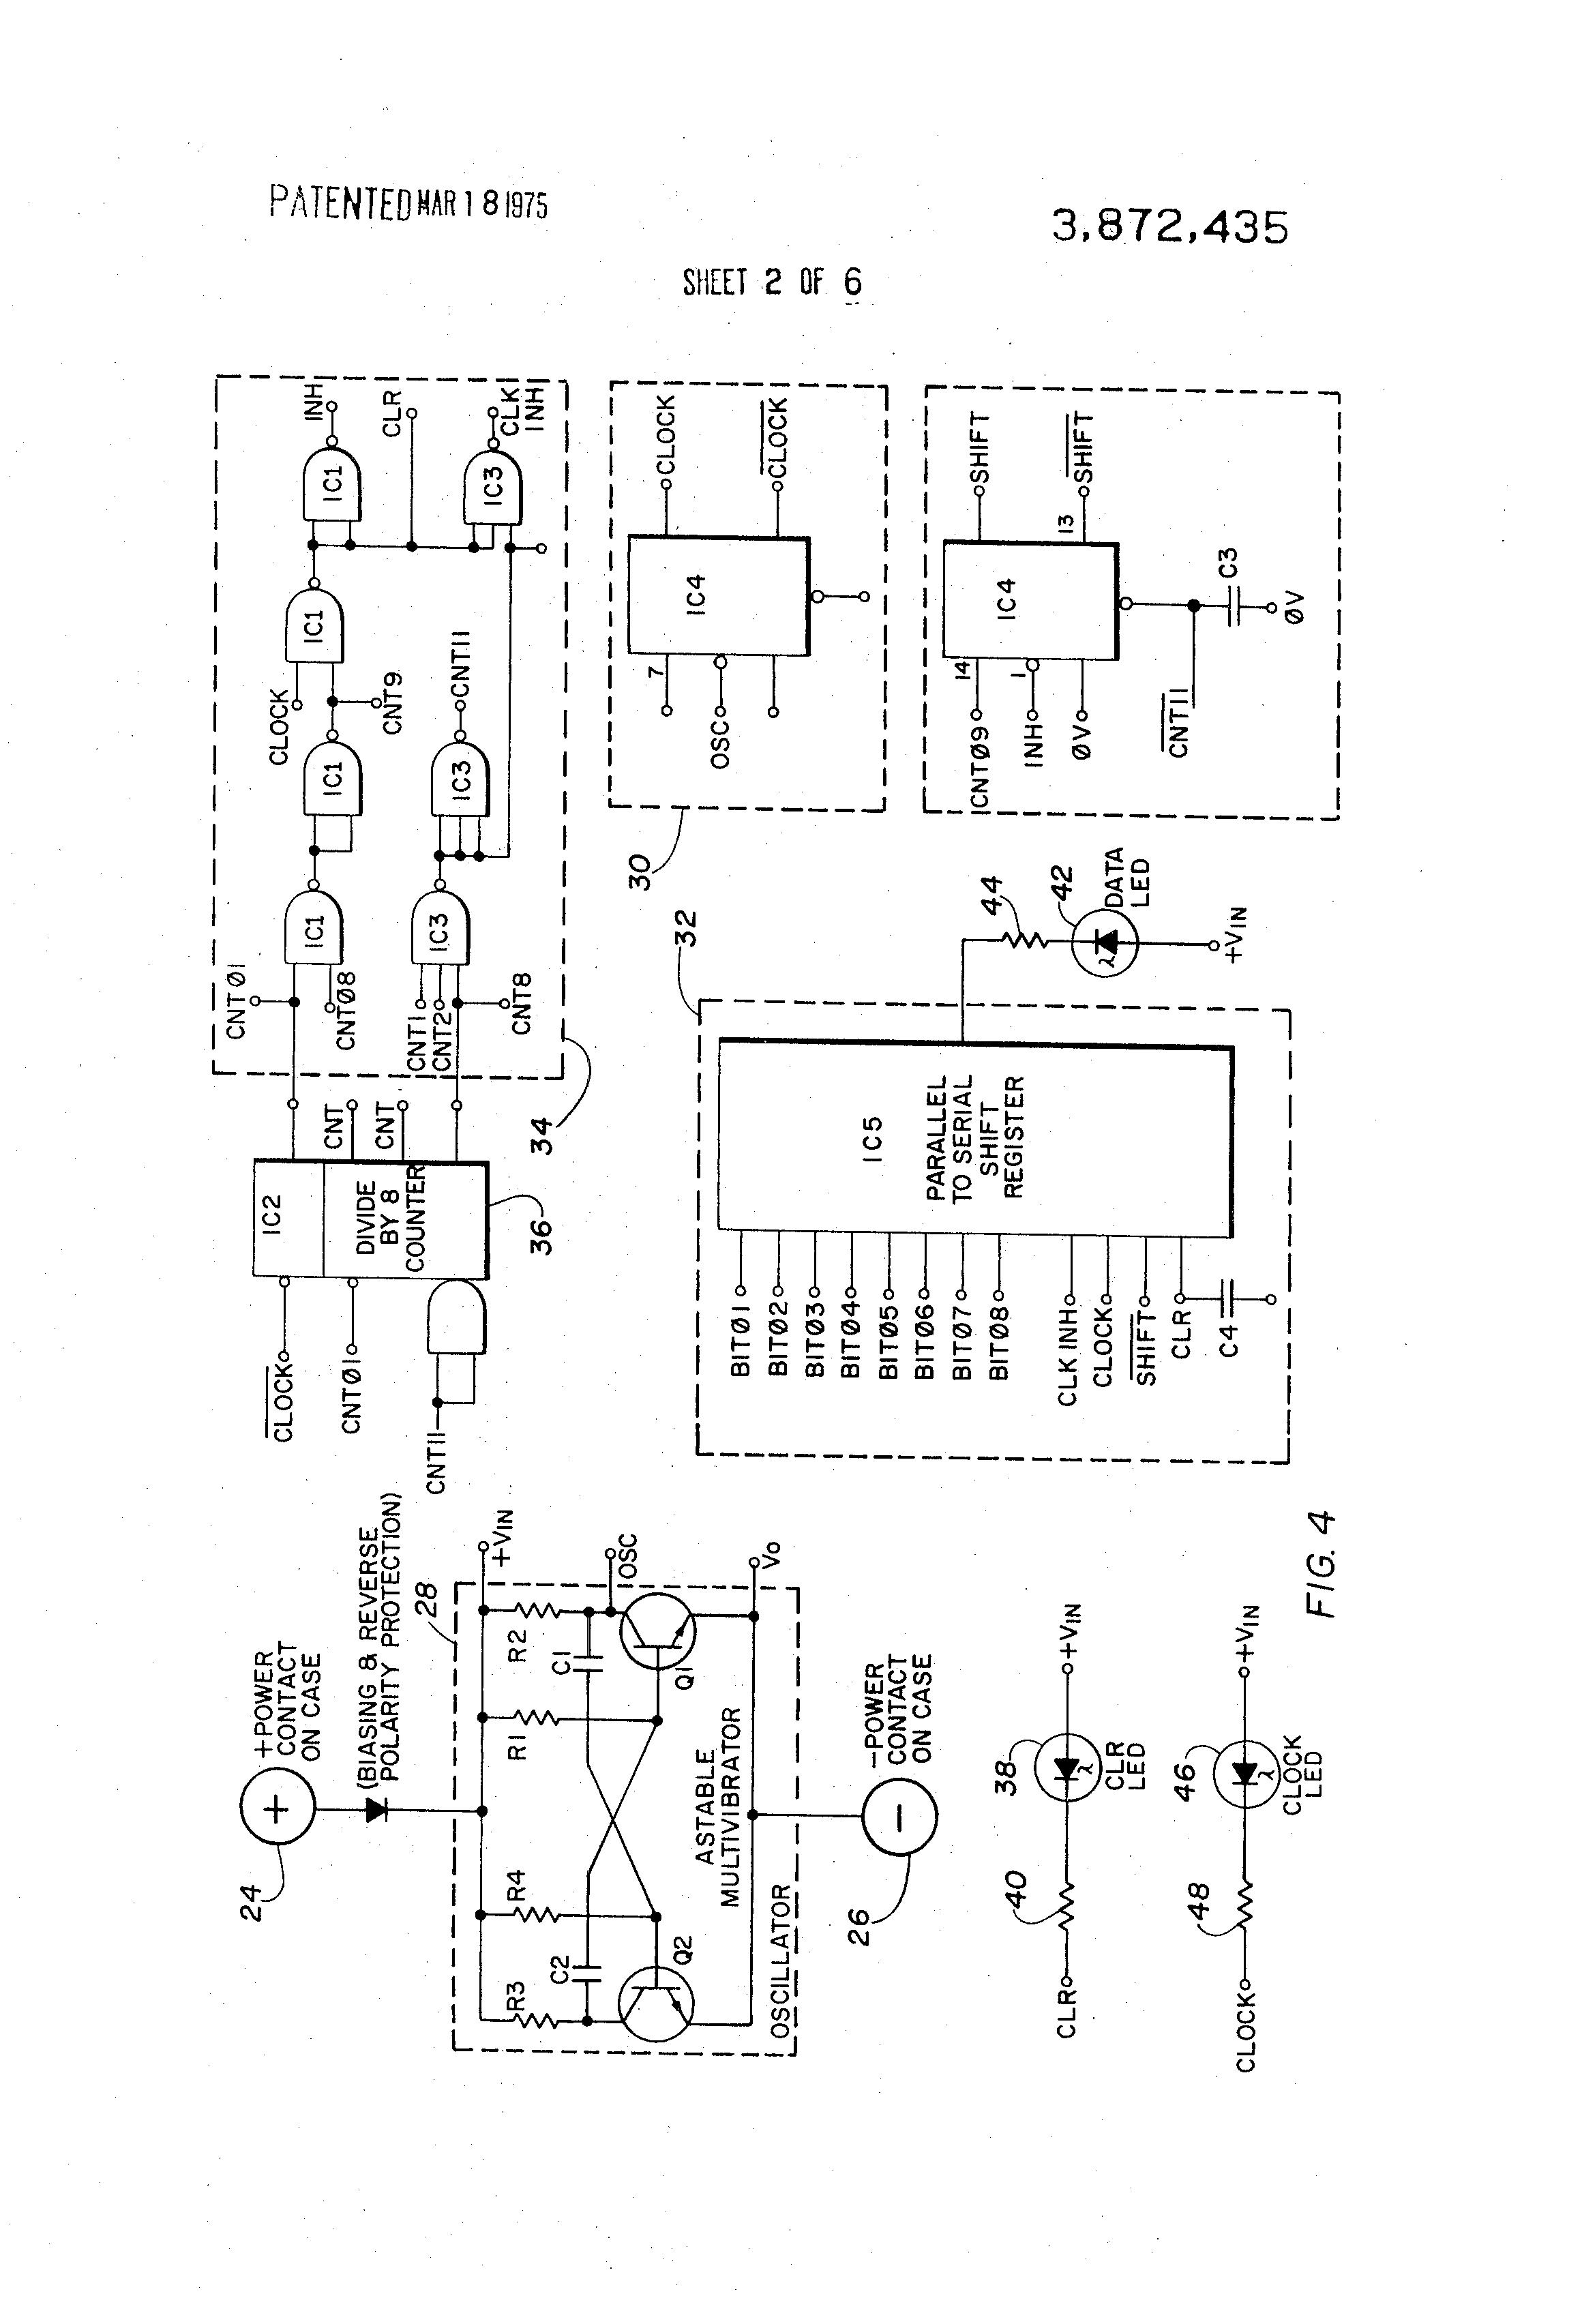 mono pump wiring diagram wiring diagram nordyne heat pump wiring diagram diagrams base